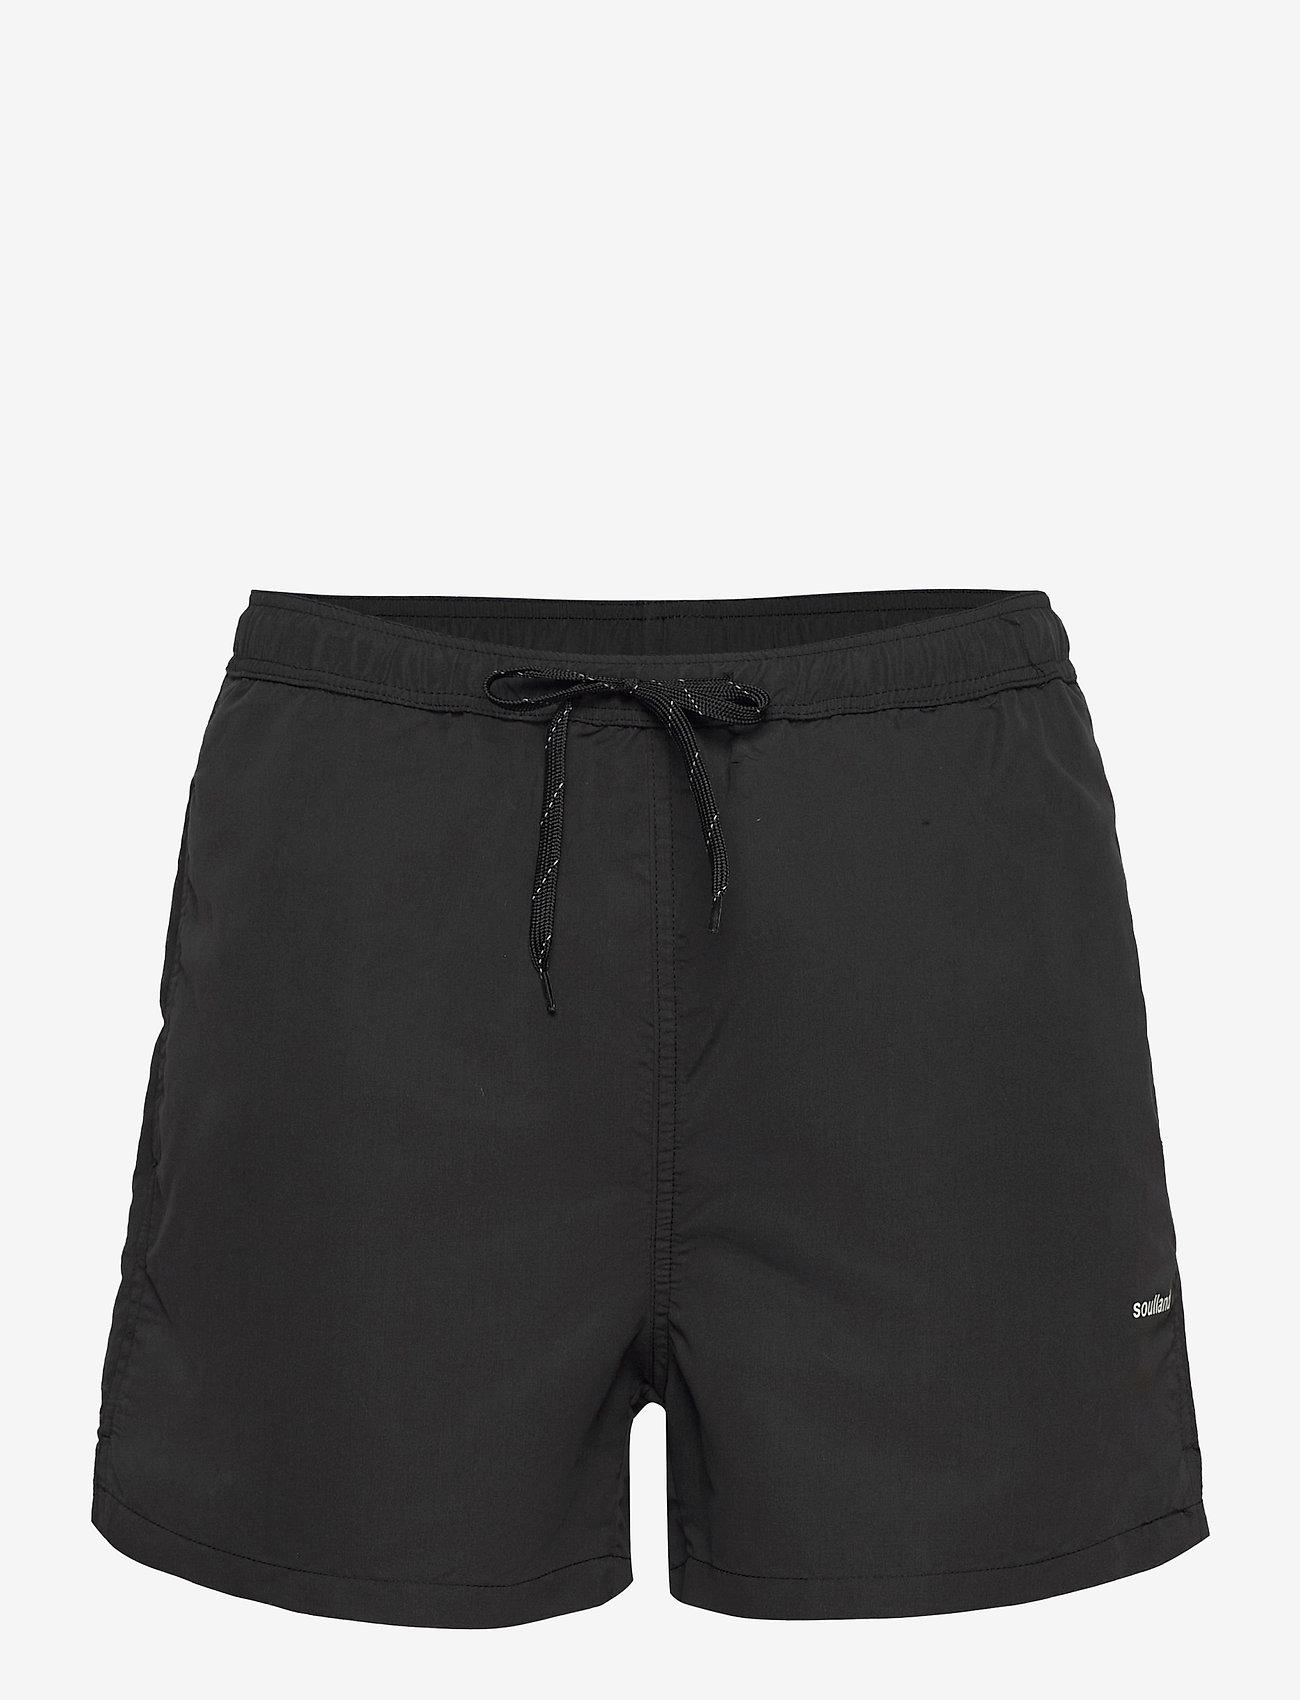 Soulland - William shorts - shorts de bain - black - 1